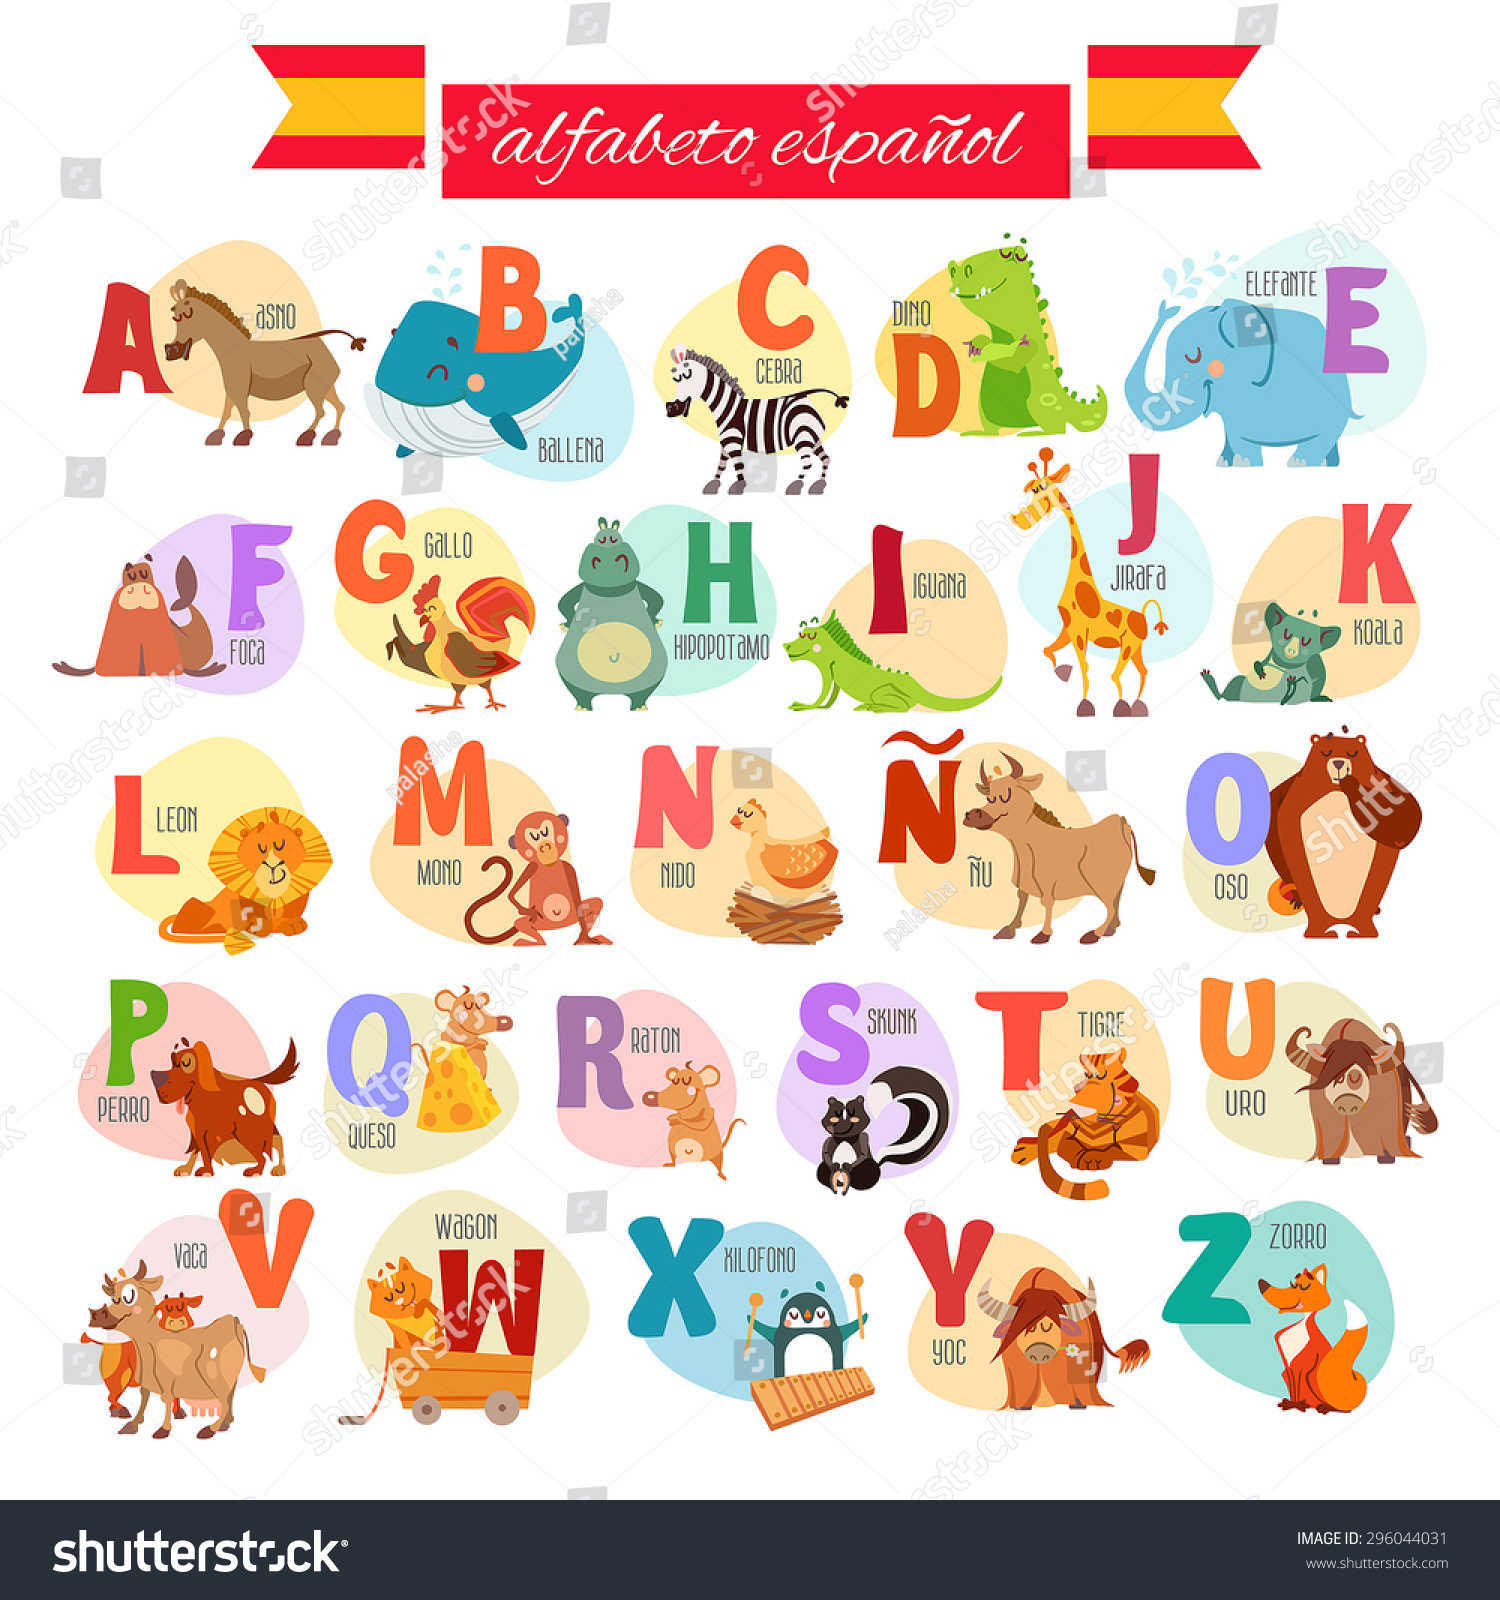 Cute Cartoon Spanish Illustrated Alphabet With Animals